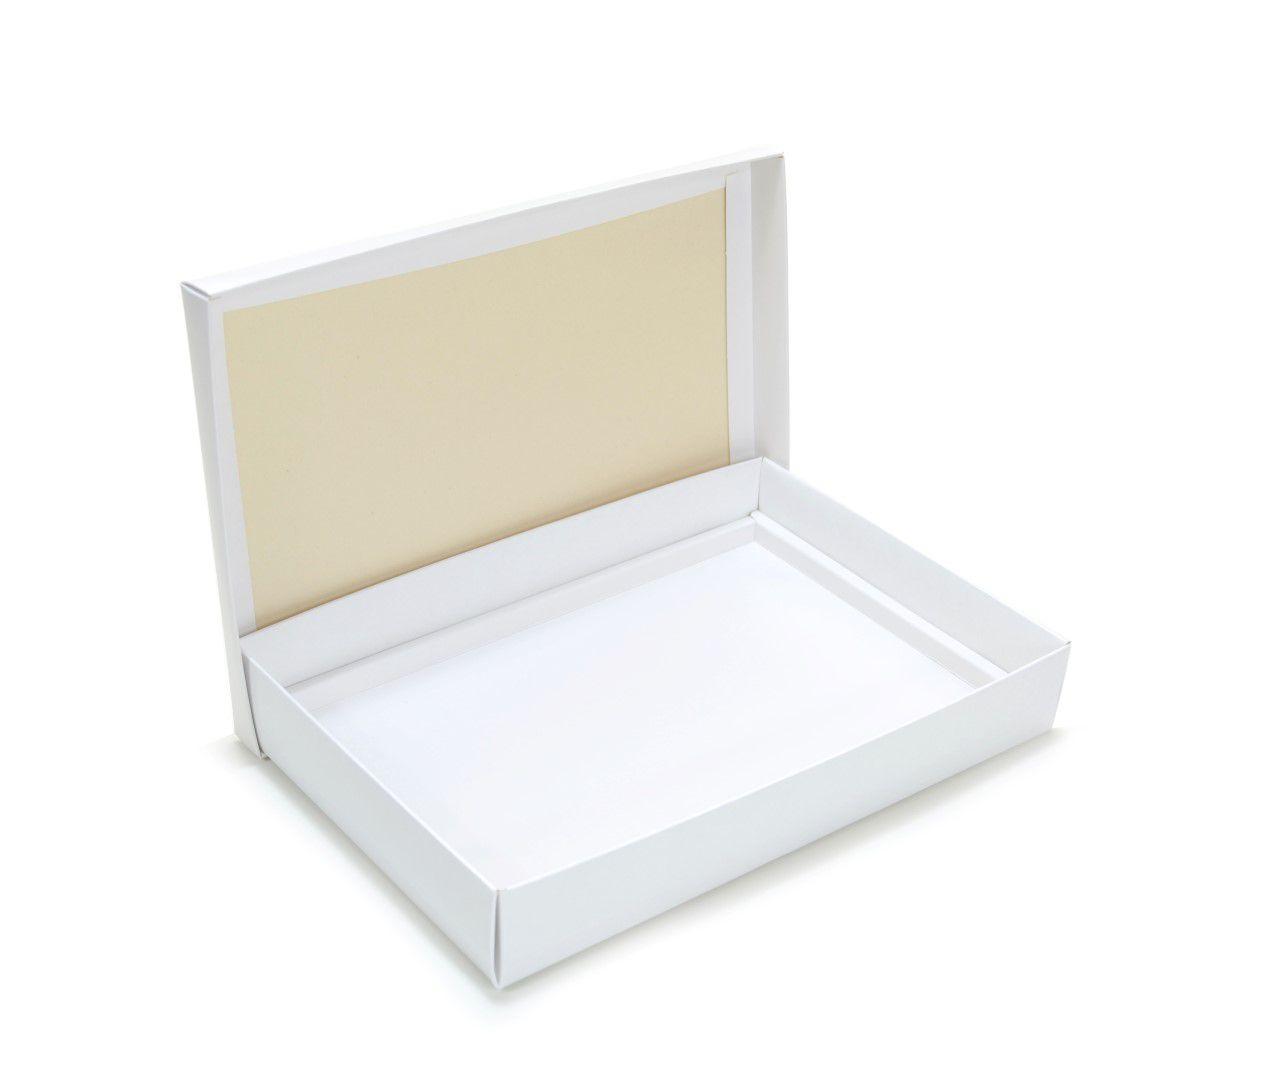 Ref 049 Branca - Caixa p/ 24 Brigadeiro Gourmet Pelotines - c/ tampa papel - 25x17x4 cm - c/ 10 unidades